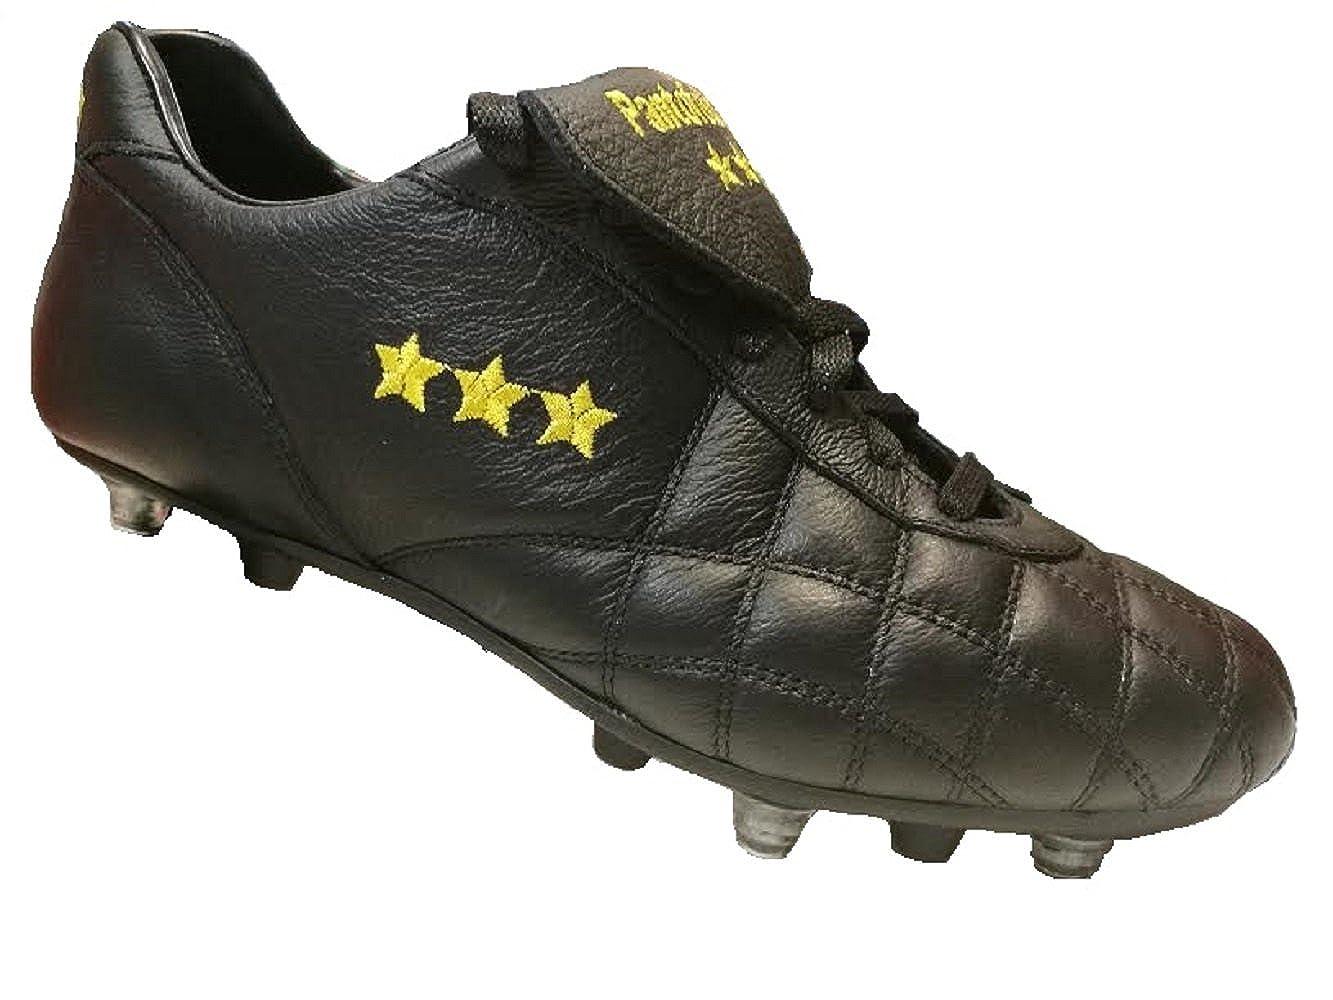 Pantofola d'Oro Herren Fußballschuhe Schwarz Schwarz 43.5